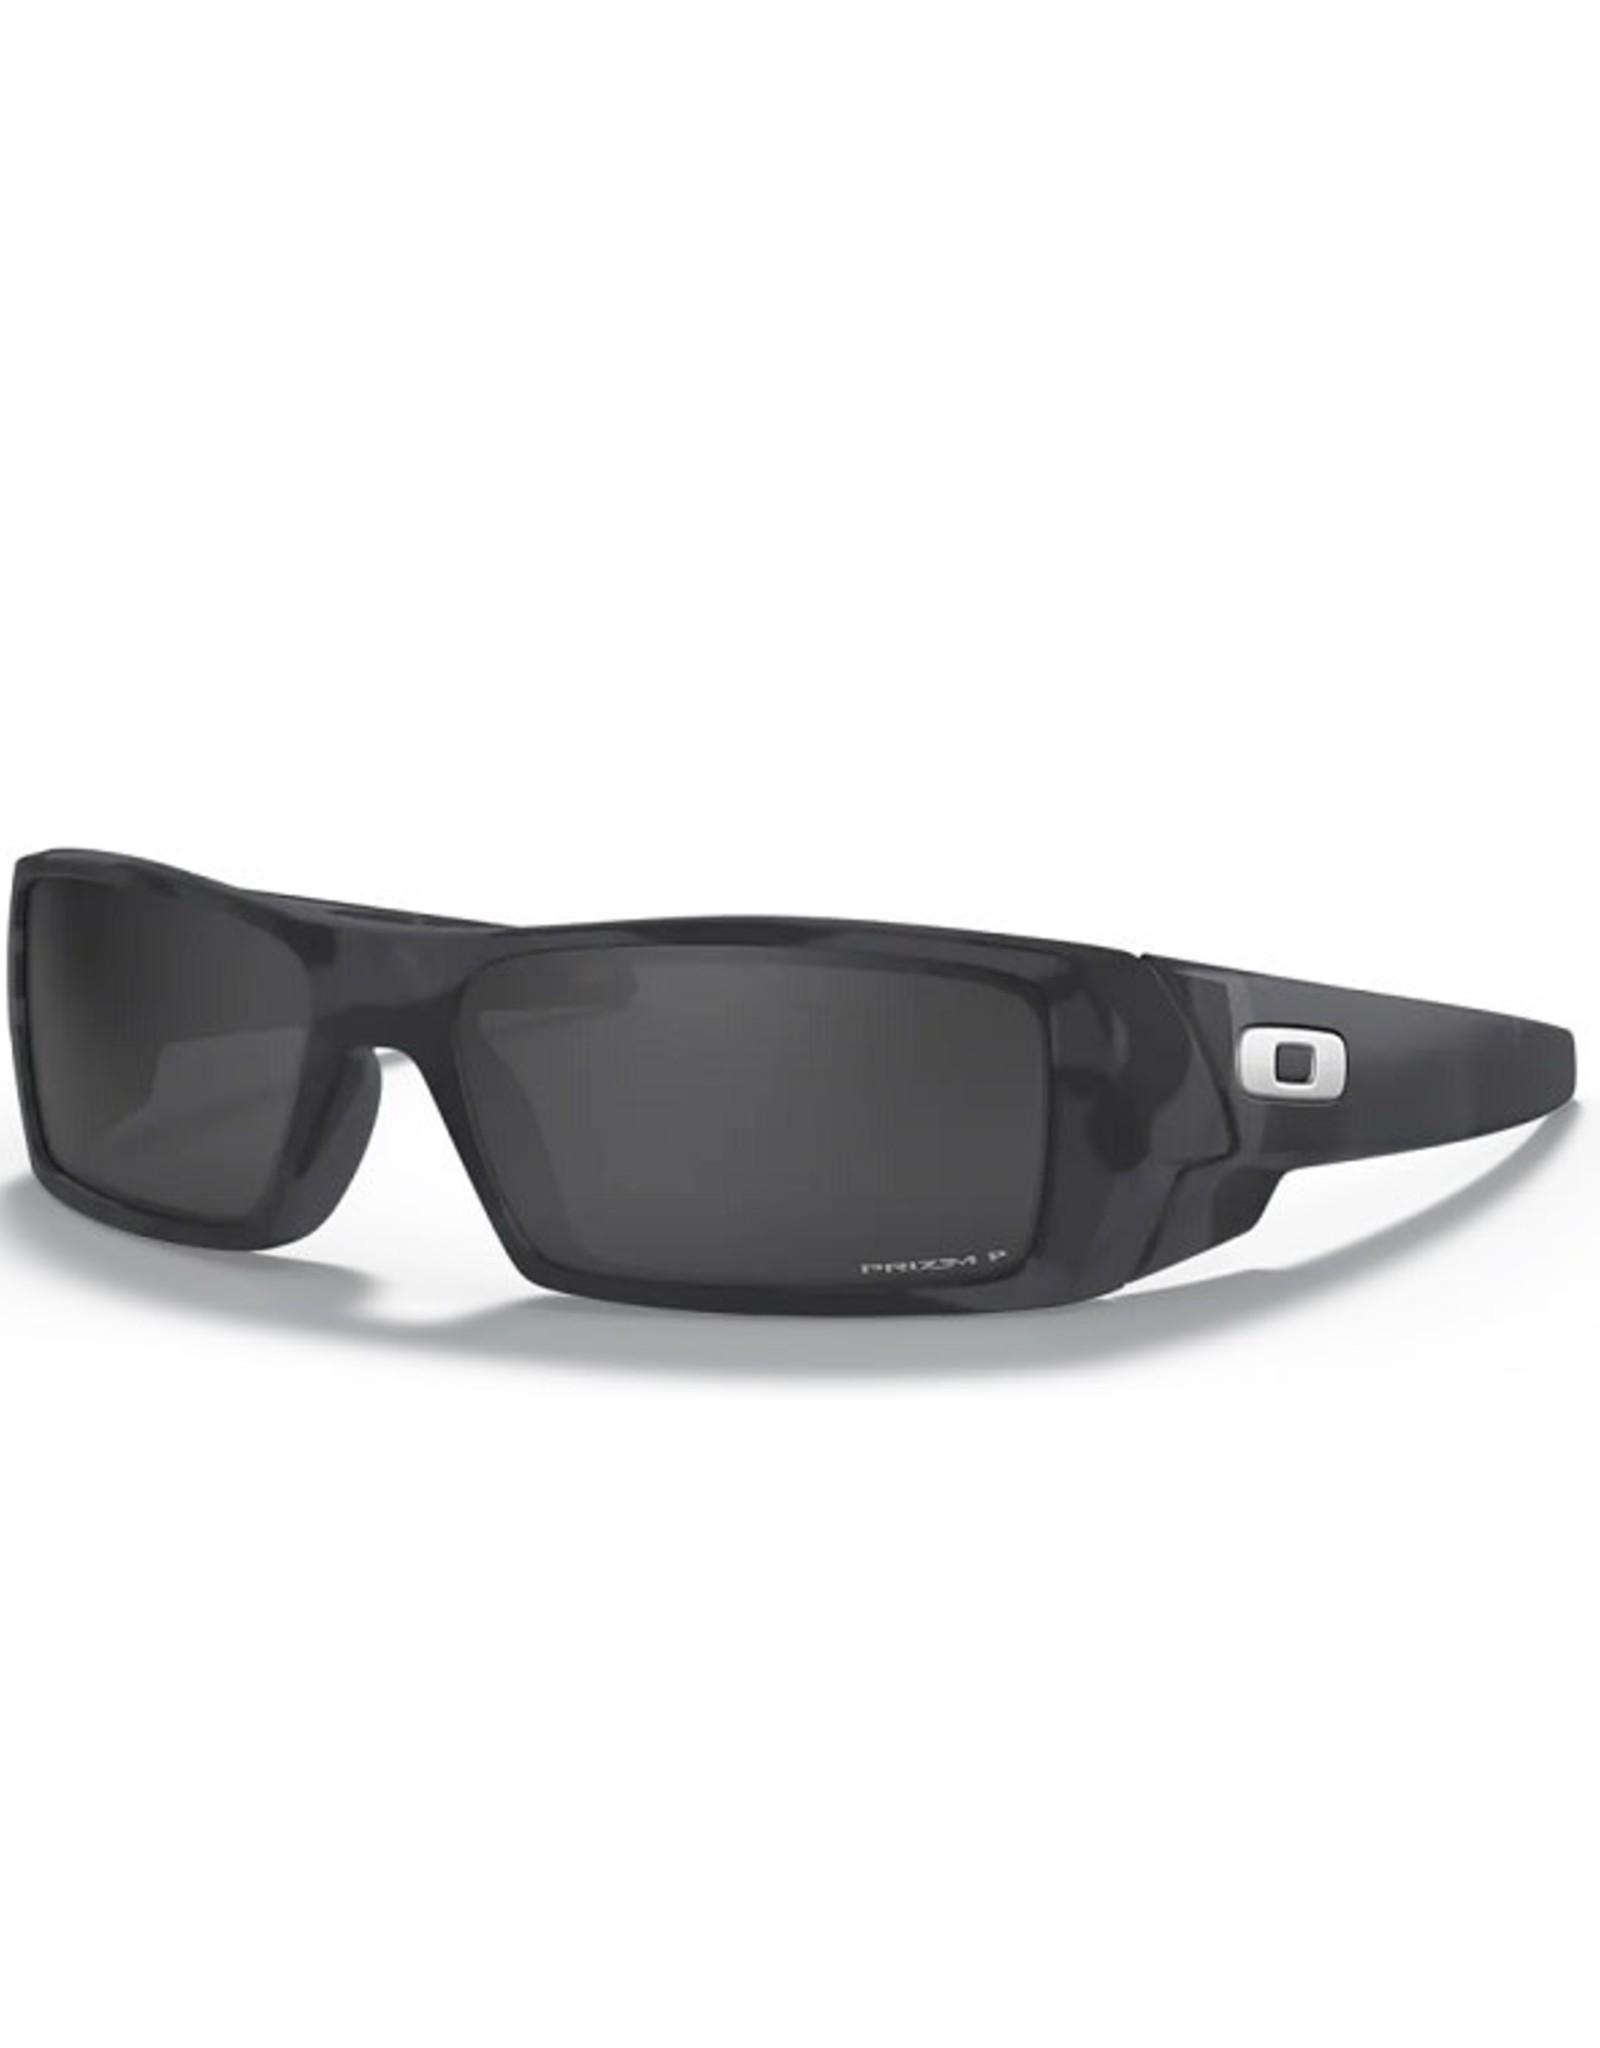 Oakley GASCAN Matte Black Camo, Prizm Black Iridium Polarized